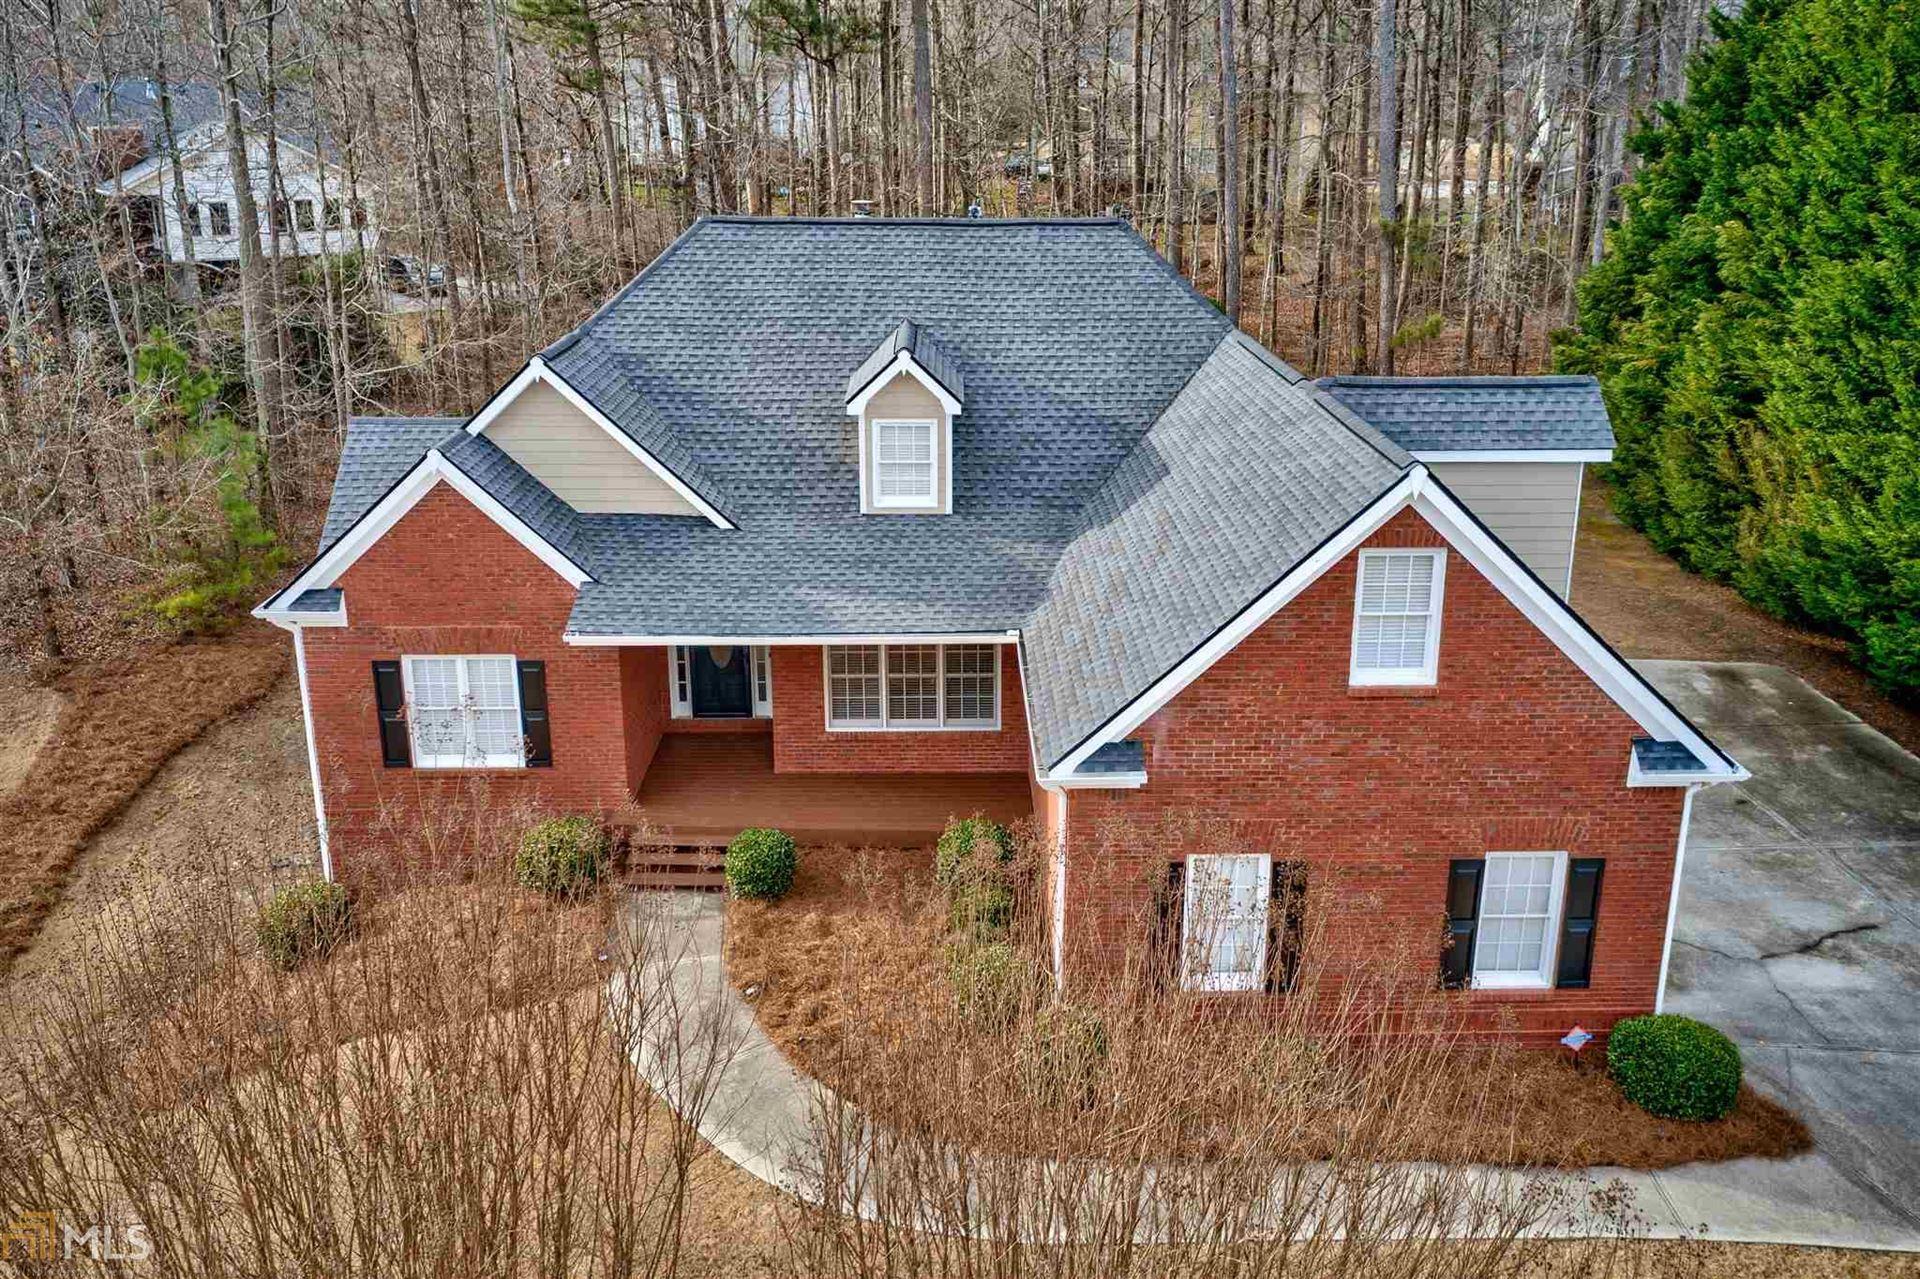 3630 Morgans Ridge Ct, Buford, GA 30519 - MLS#: 8936009